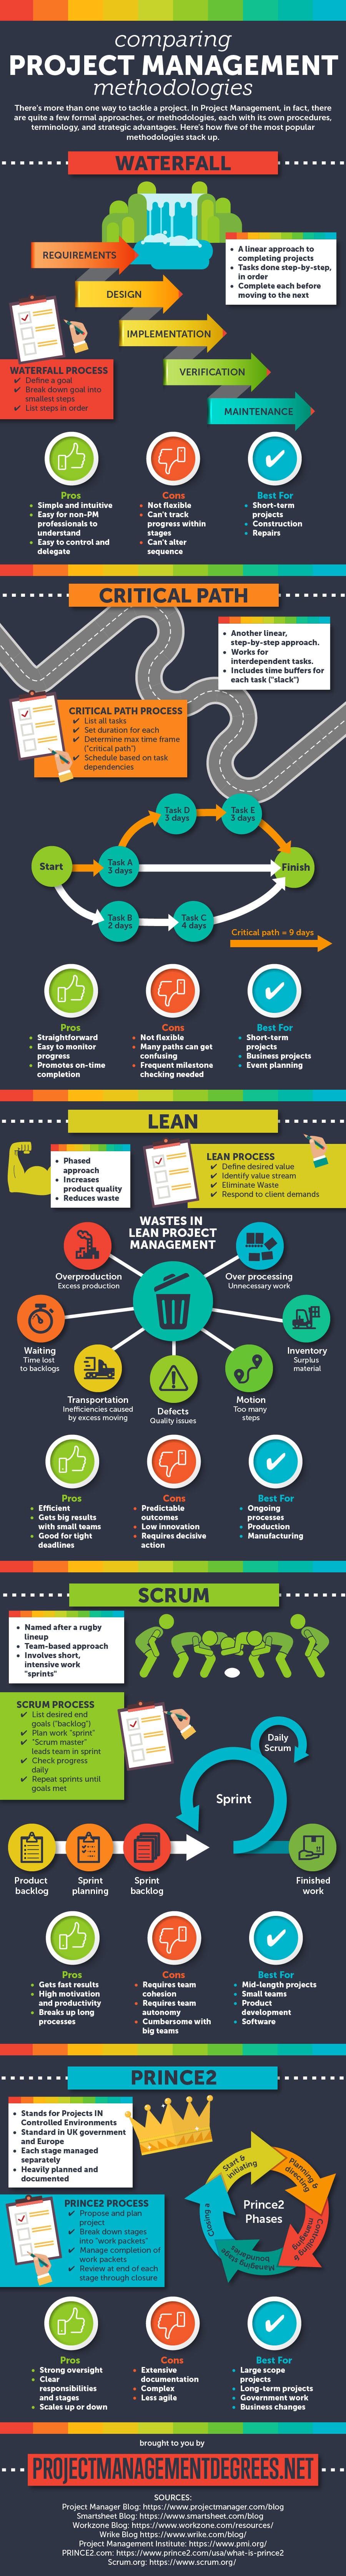 Project Management Methodologies Infographic